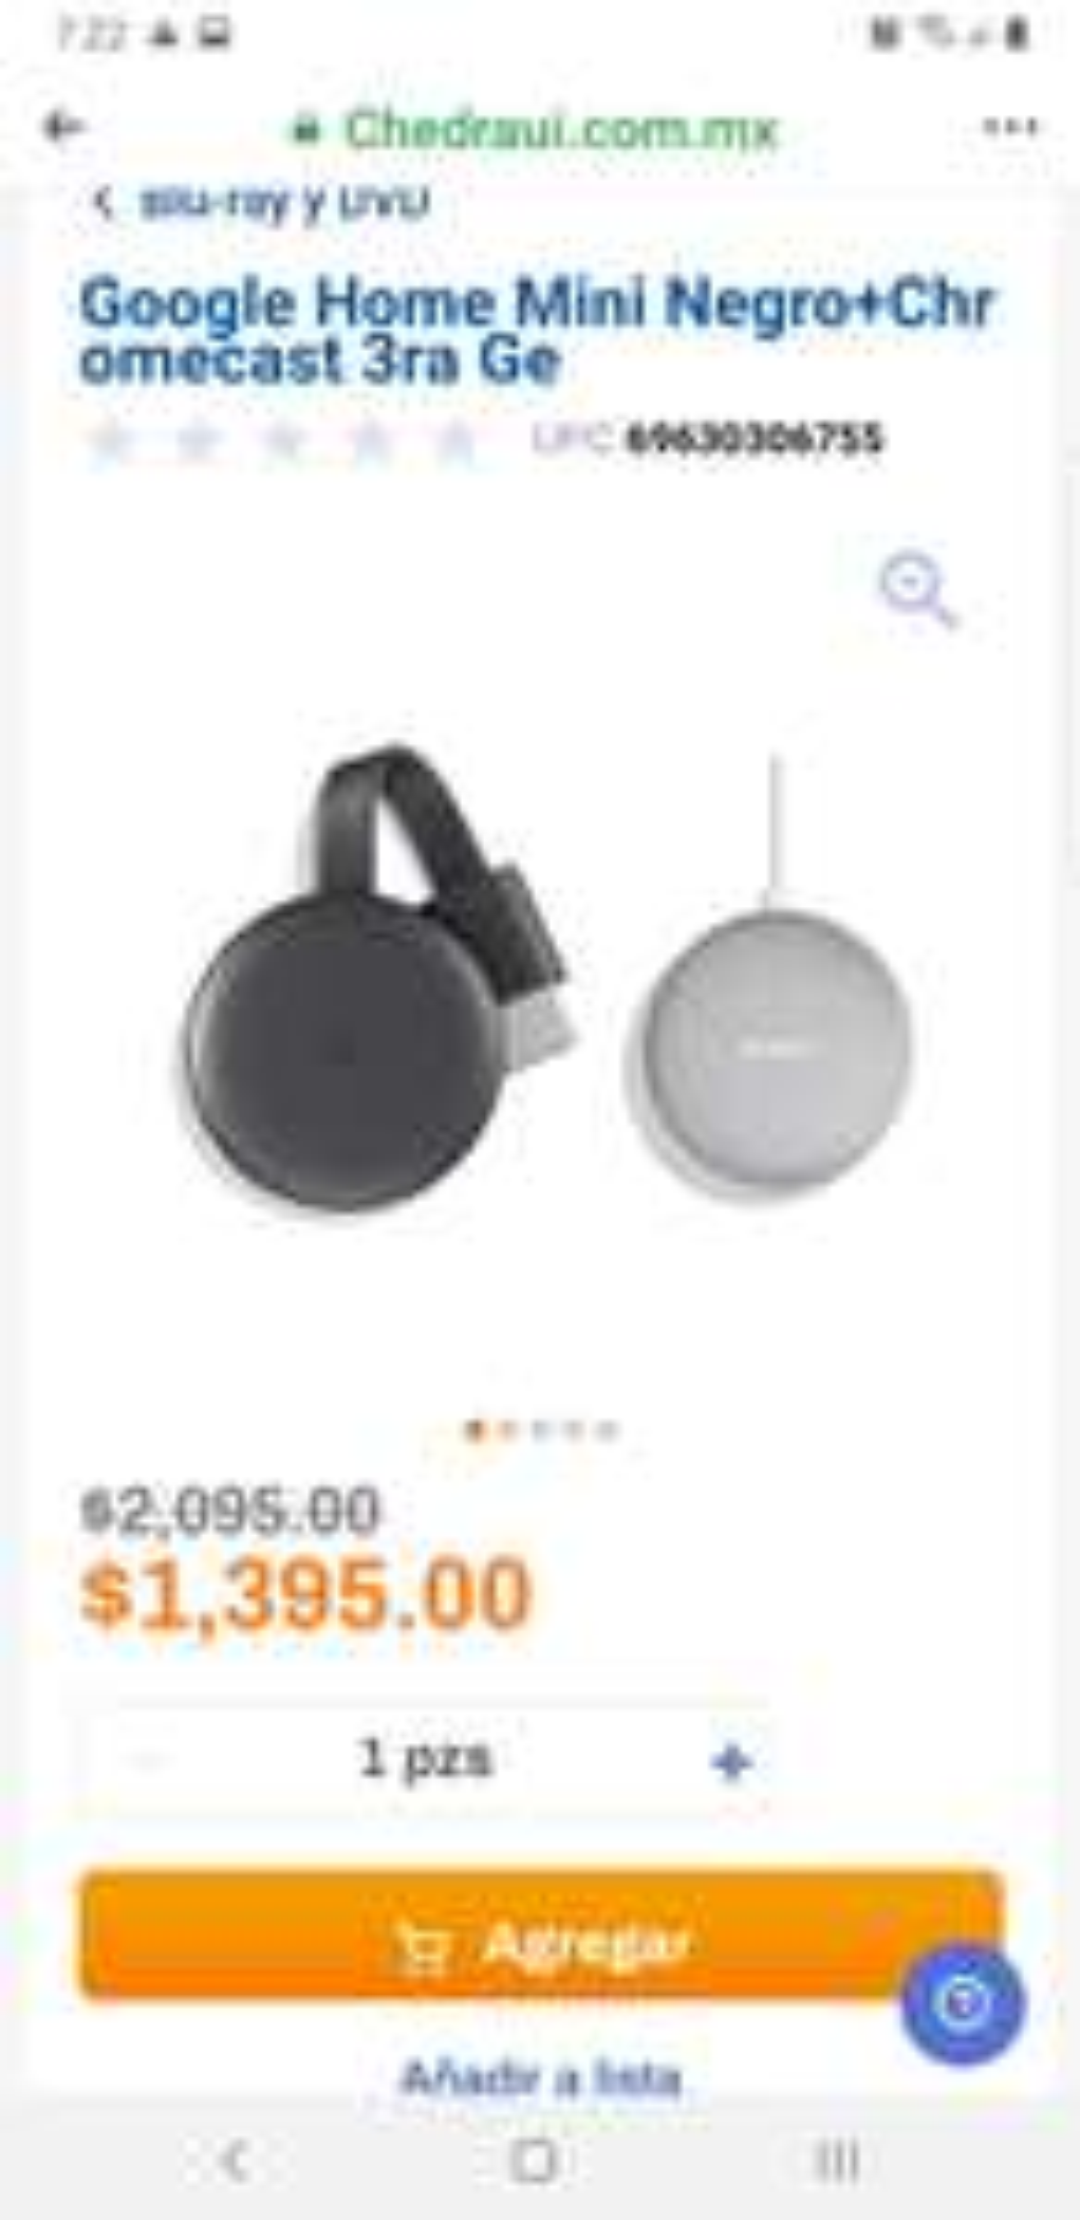 Chedraui: Google Home Mini Negro+Chromecast 3ra Generación